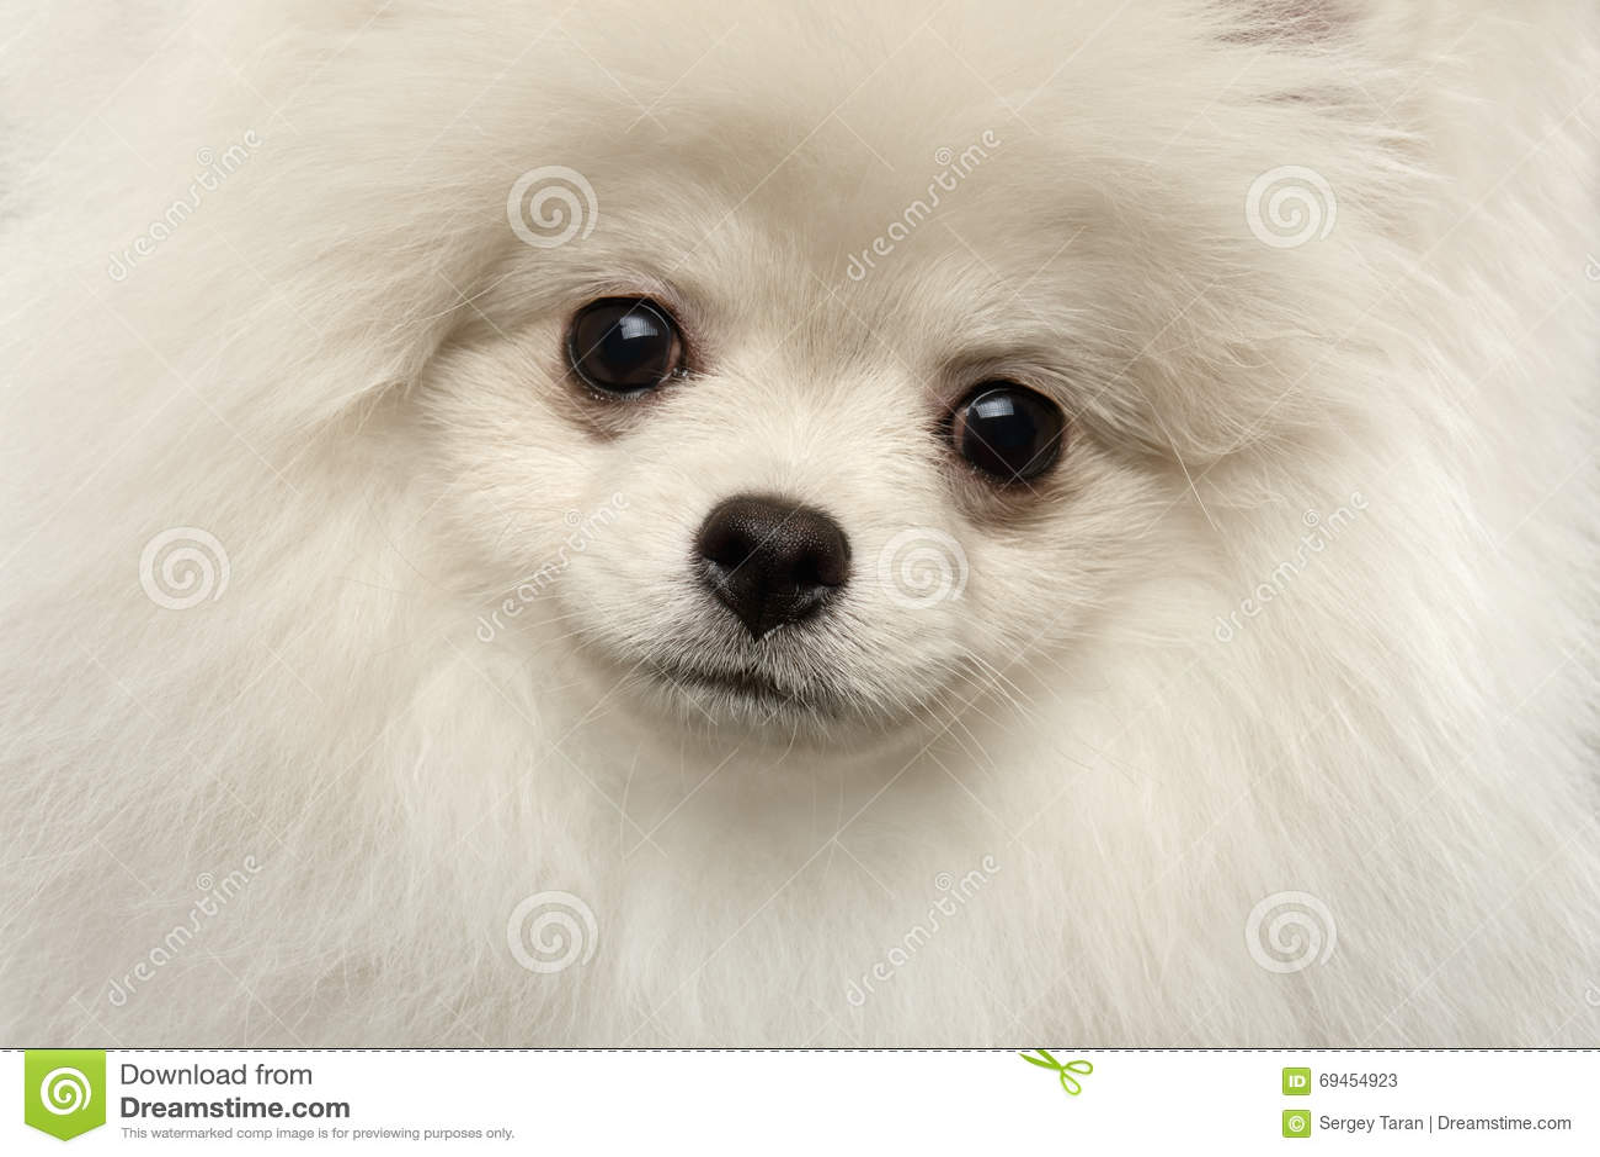 Cute Puppy Images Wallpaper Fluffy Closeup Furry Cute White Pomeranian Spitz Dog Funny